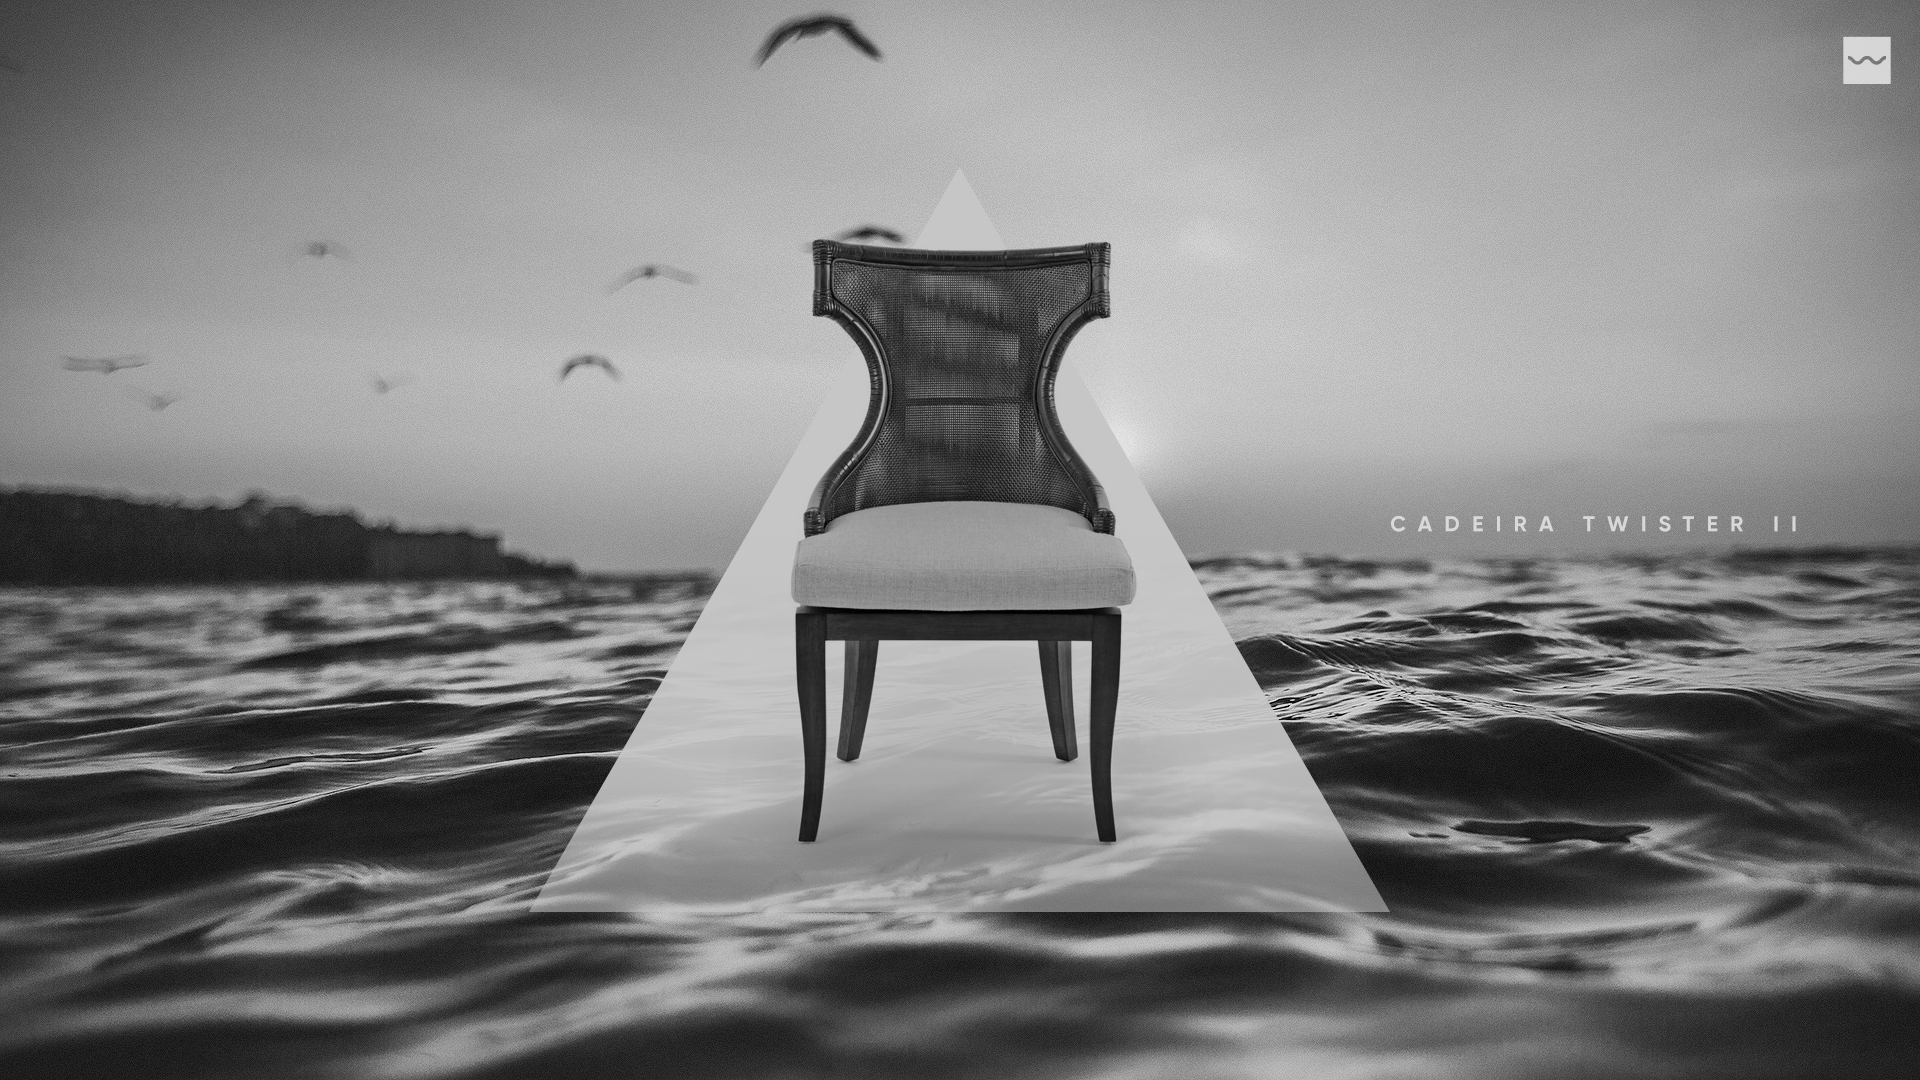 sagrada_cadeira.jpg